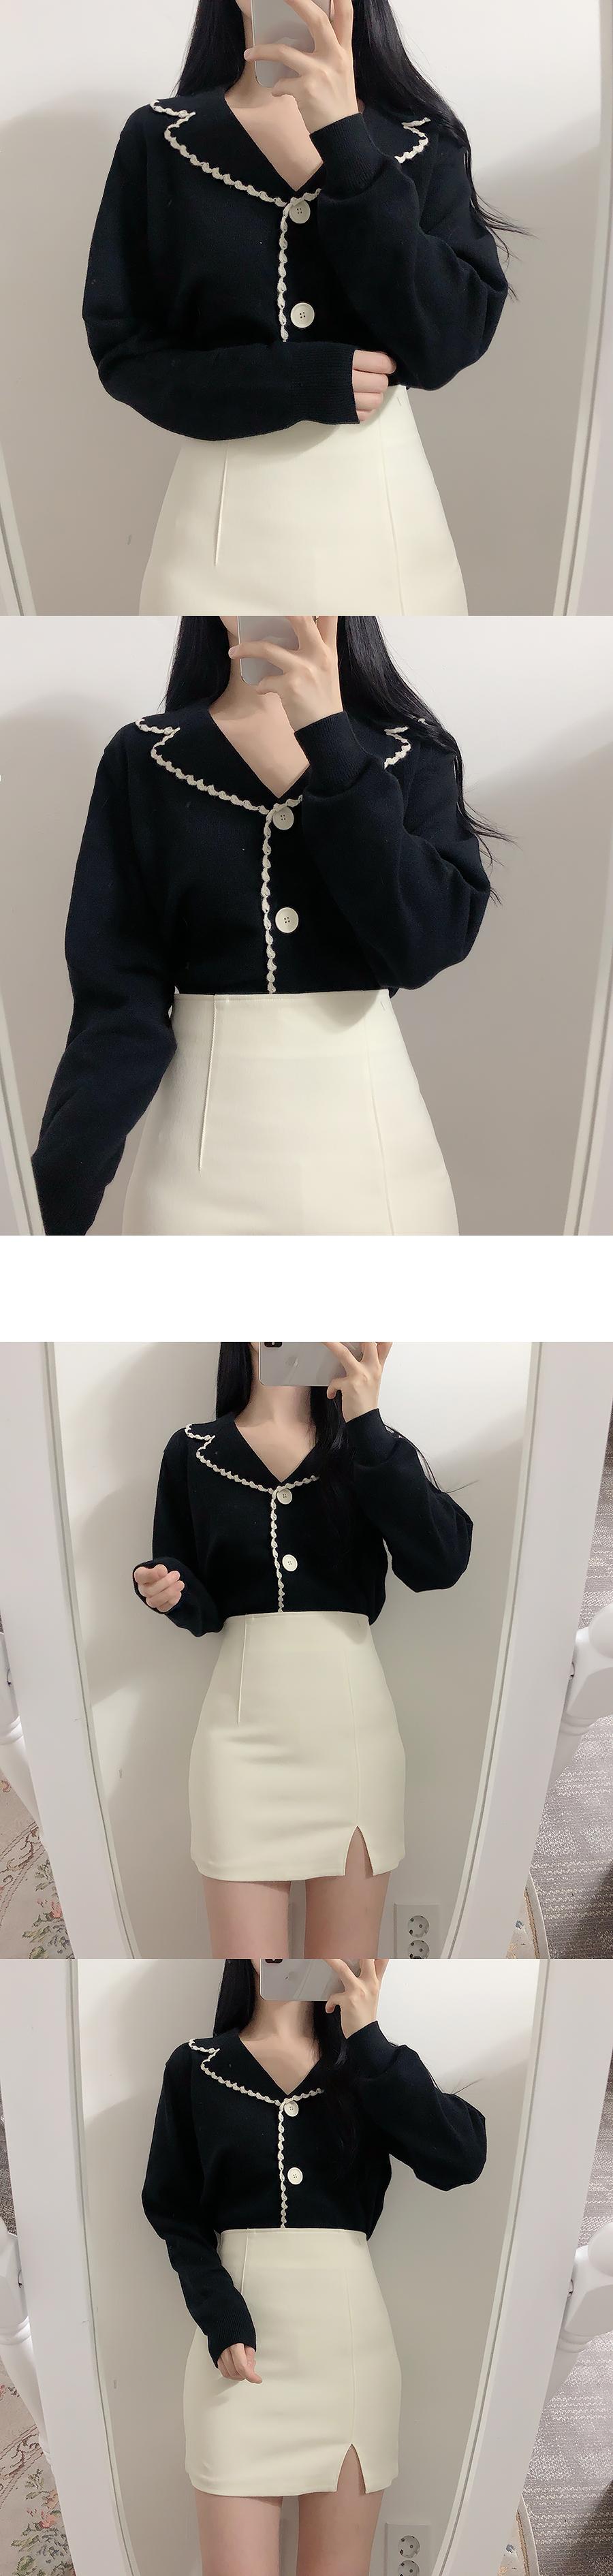 Humming trimmed line skirt